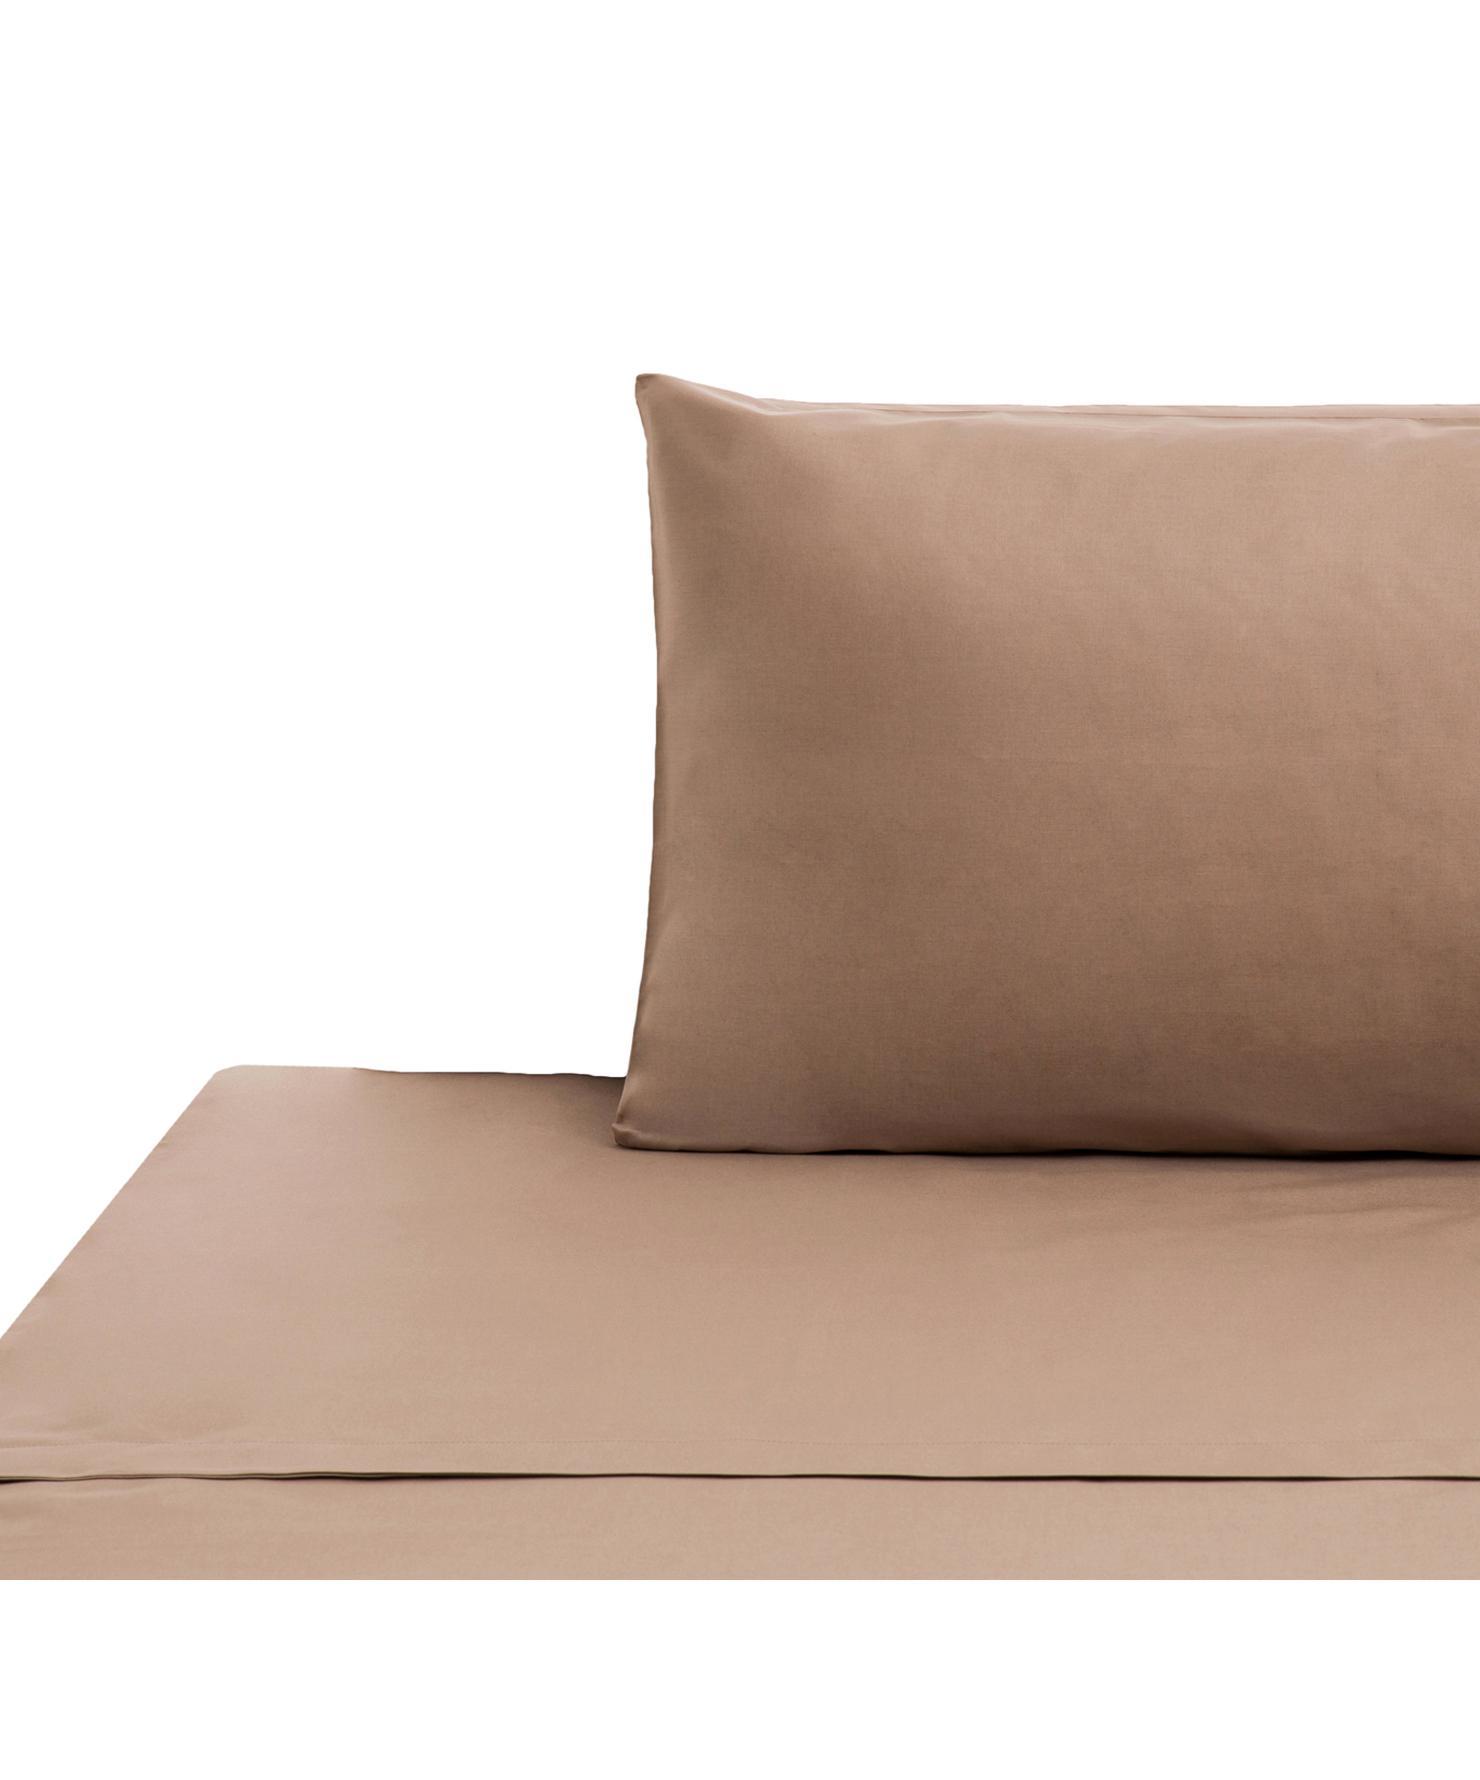 Set lenzuola in cotone ranforce Lenare 2 pz, Tessuto: Renforcé, Fronte e retro: taupe, 150 x 290 cm